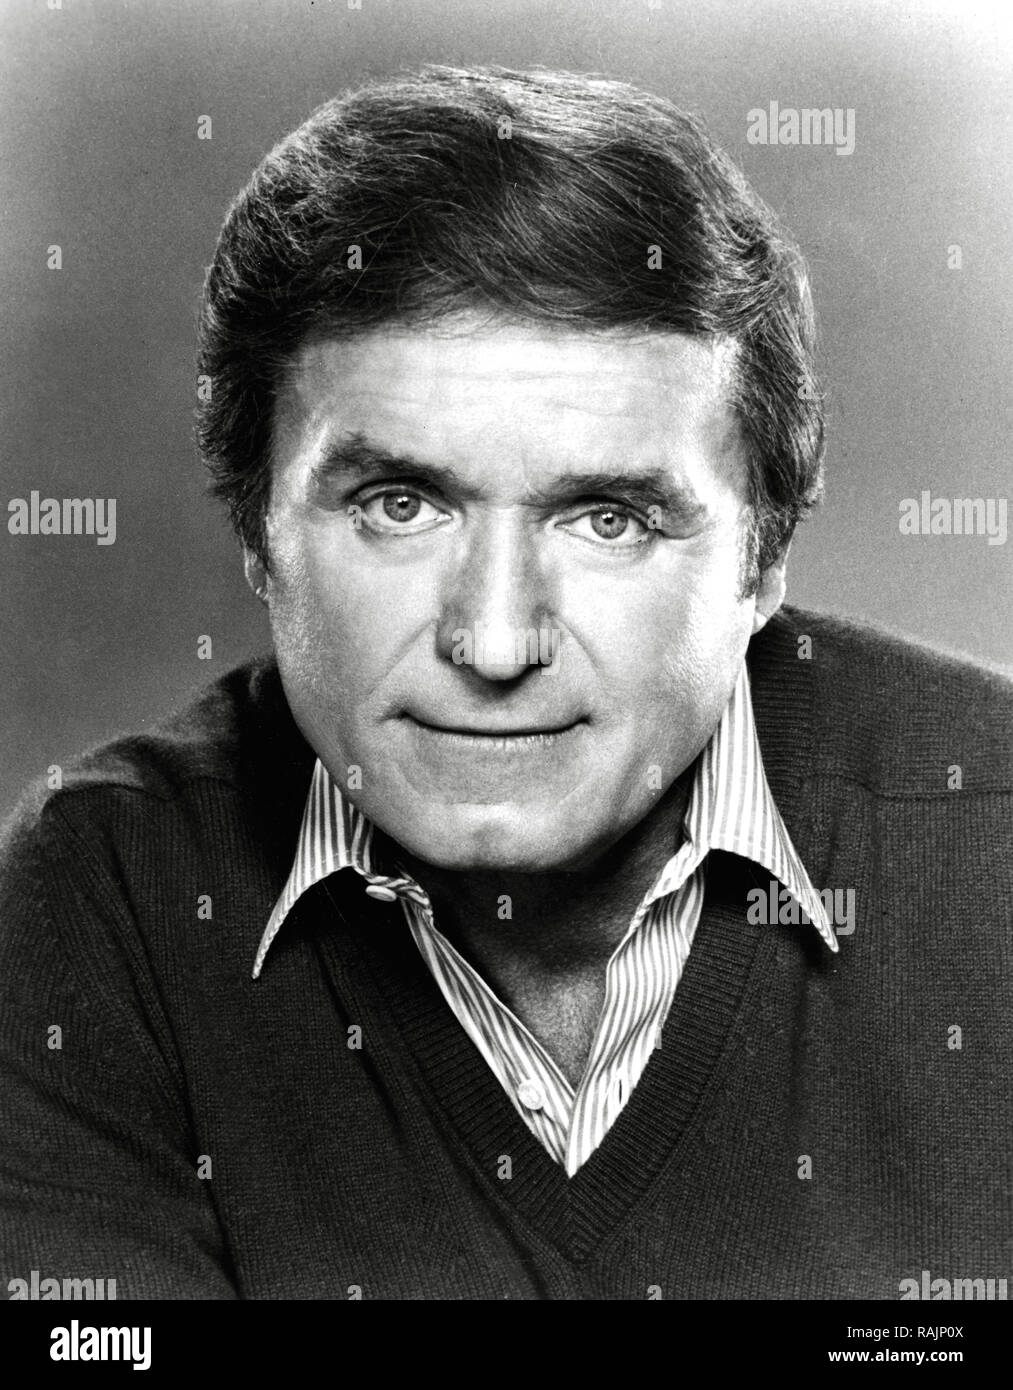 Publicity photo of Mike Douglas,  circa 1986    File Reference # 33636 955THA Stock Photo